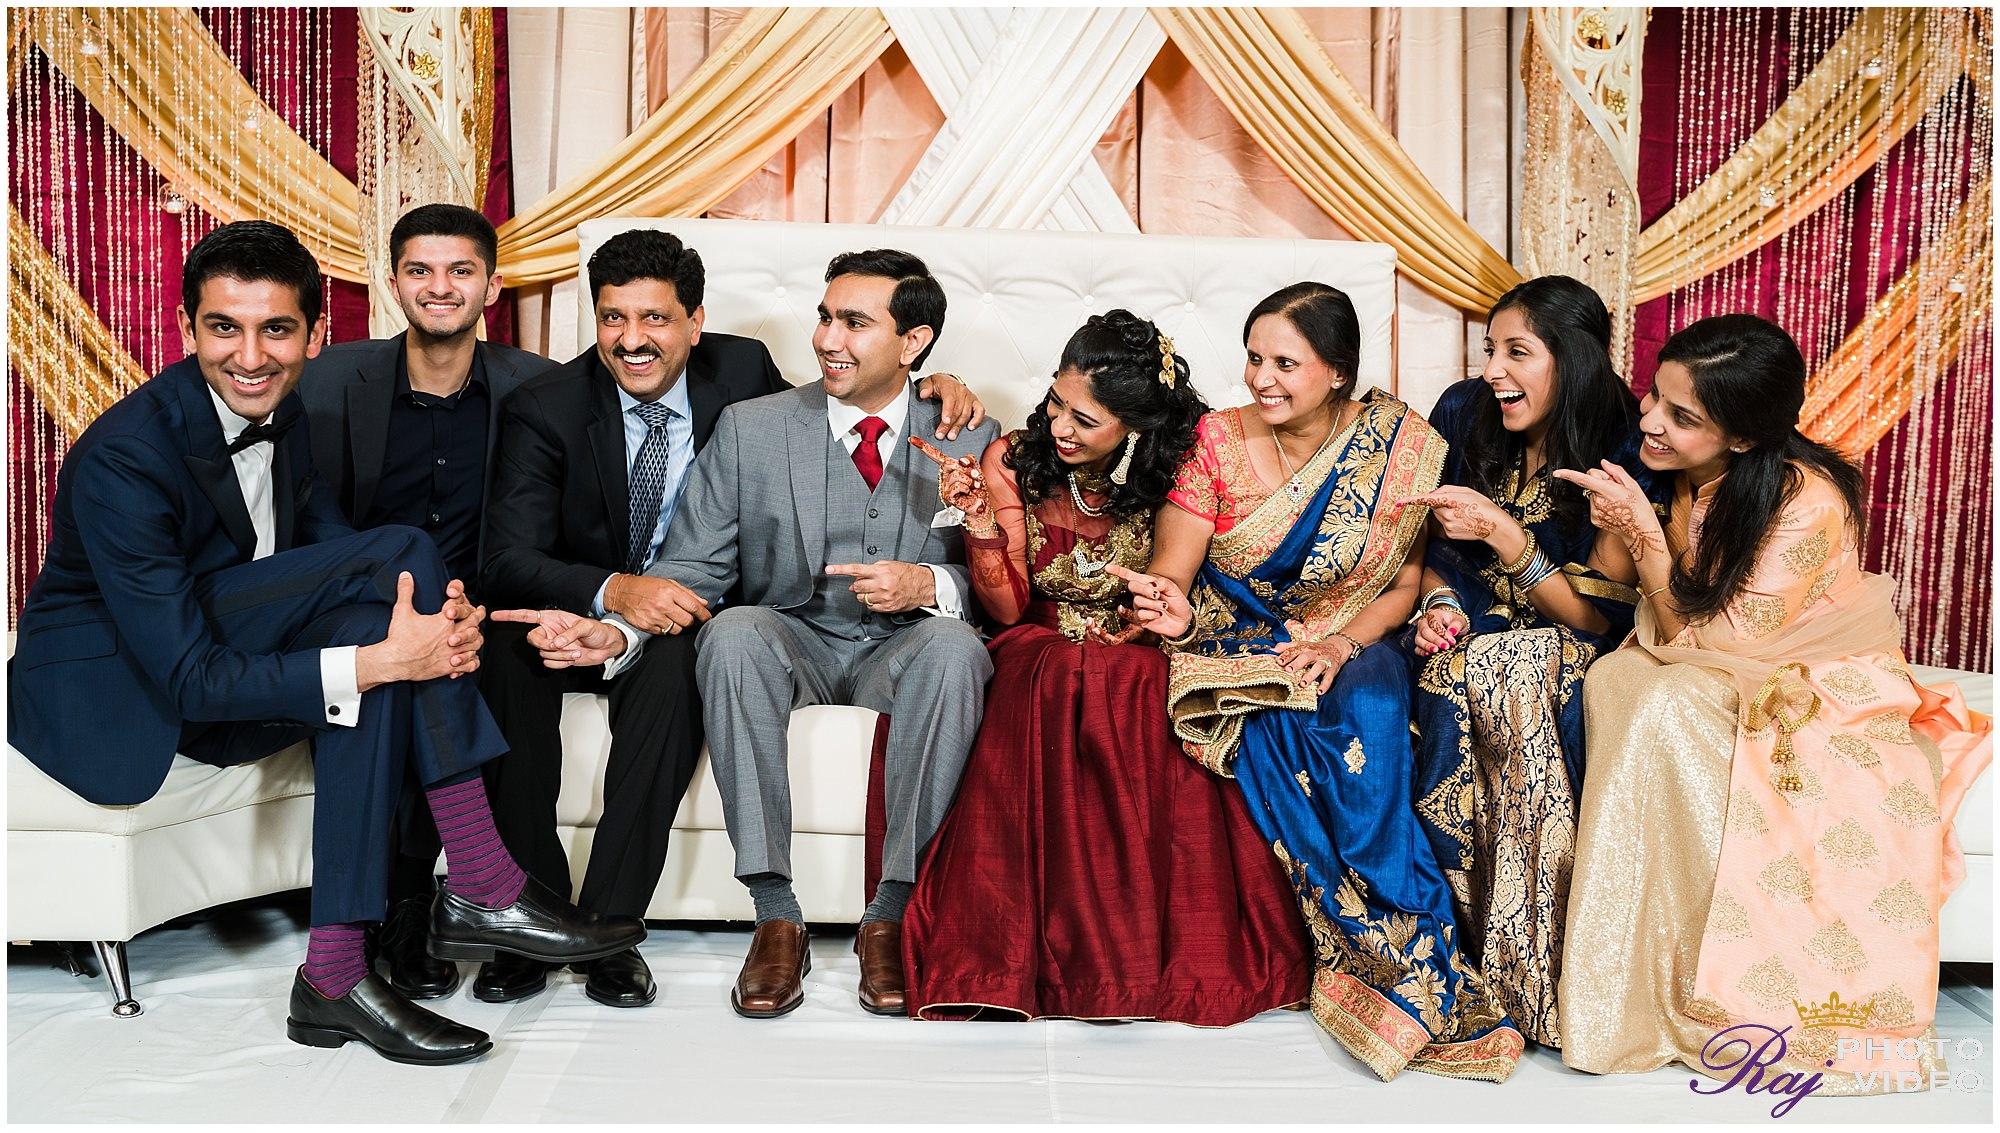 Founders-Inn-and-Spa-Virginia-Beach-VA-Indian-Wedding-Harini-Vivek-91.jpg